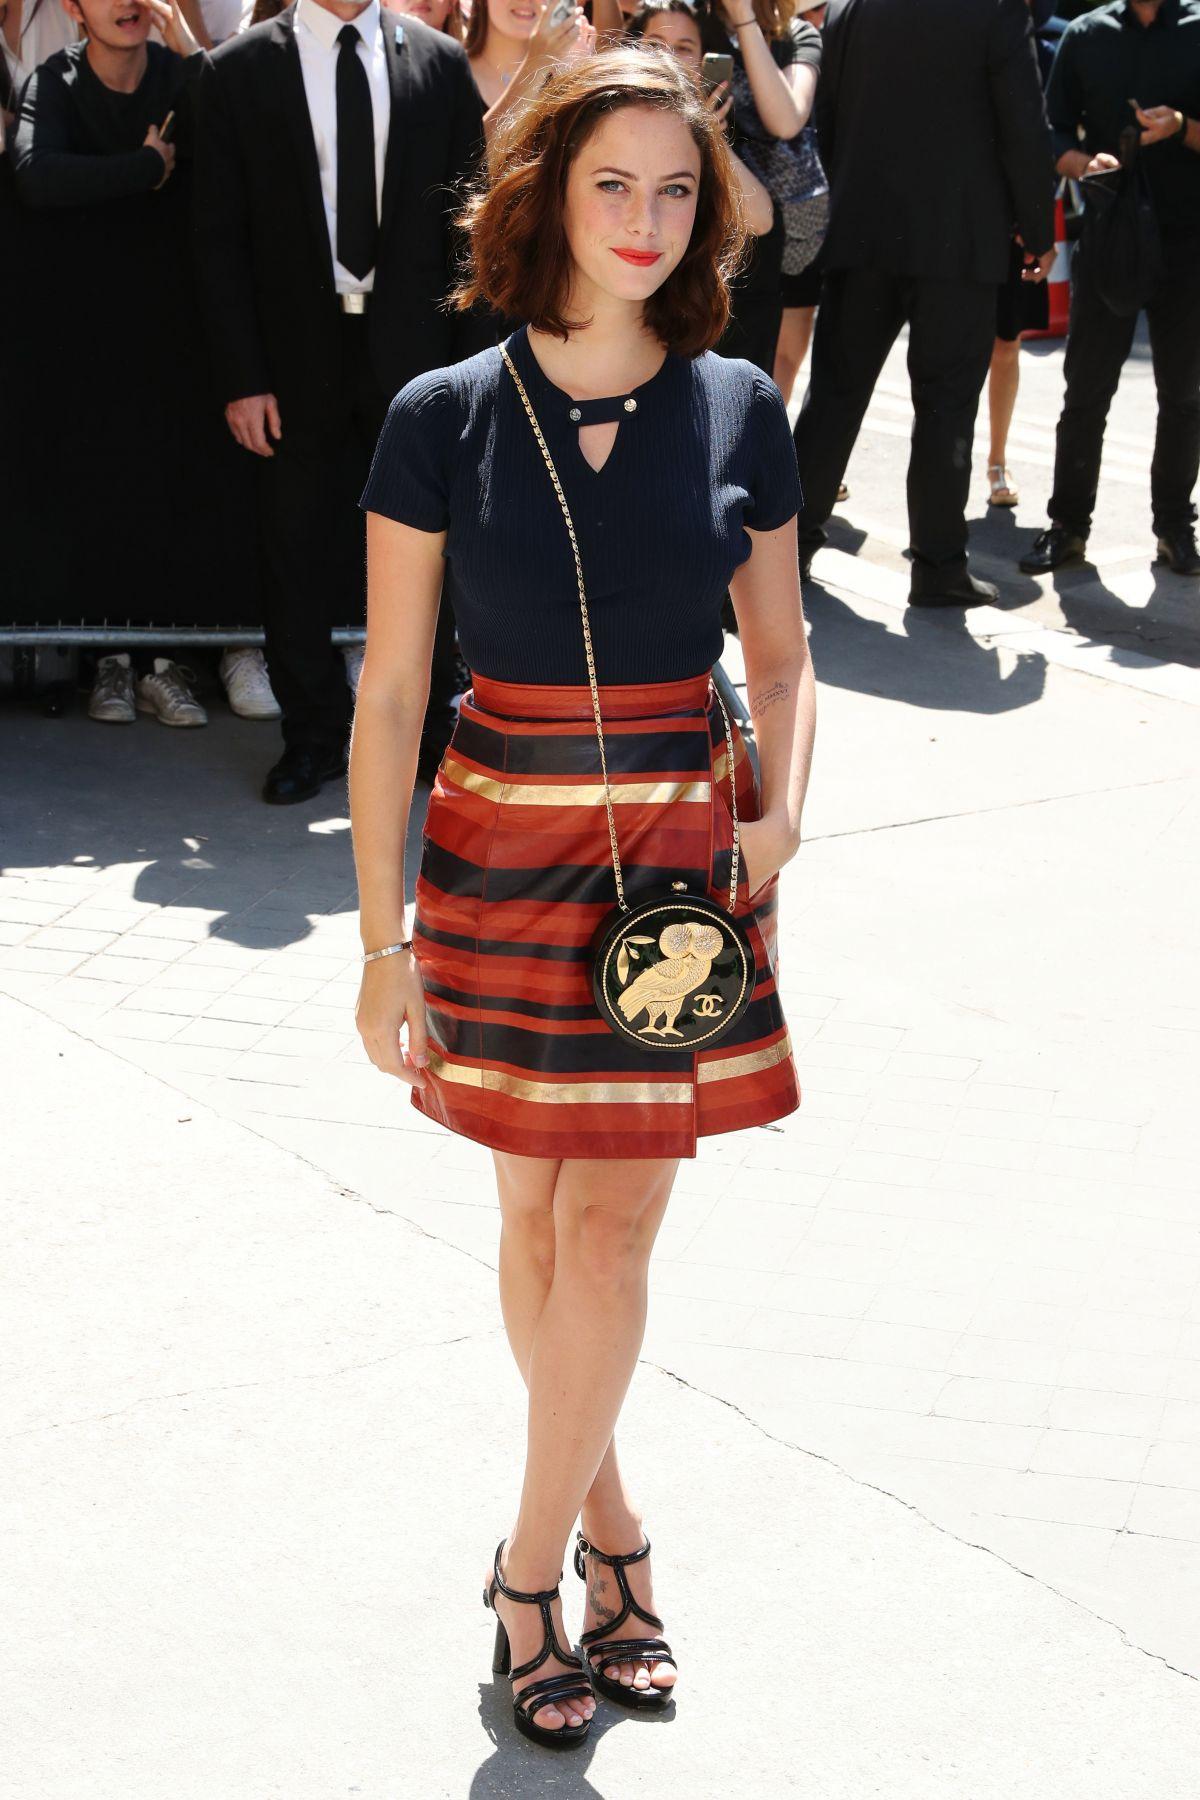 KAYA SCODELARIO At Chanel Fashion Show At Haute Couture